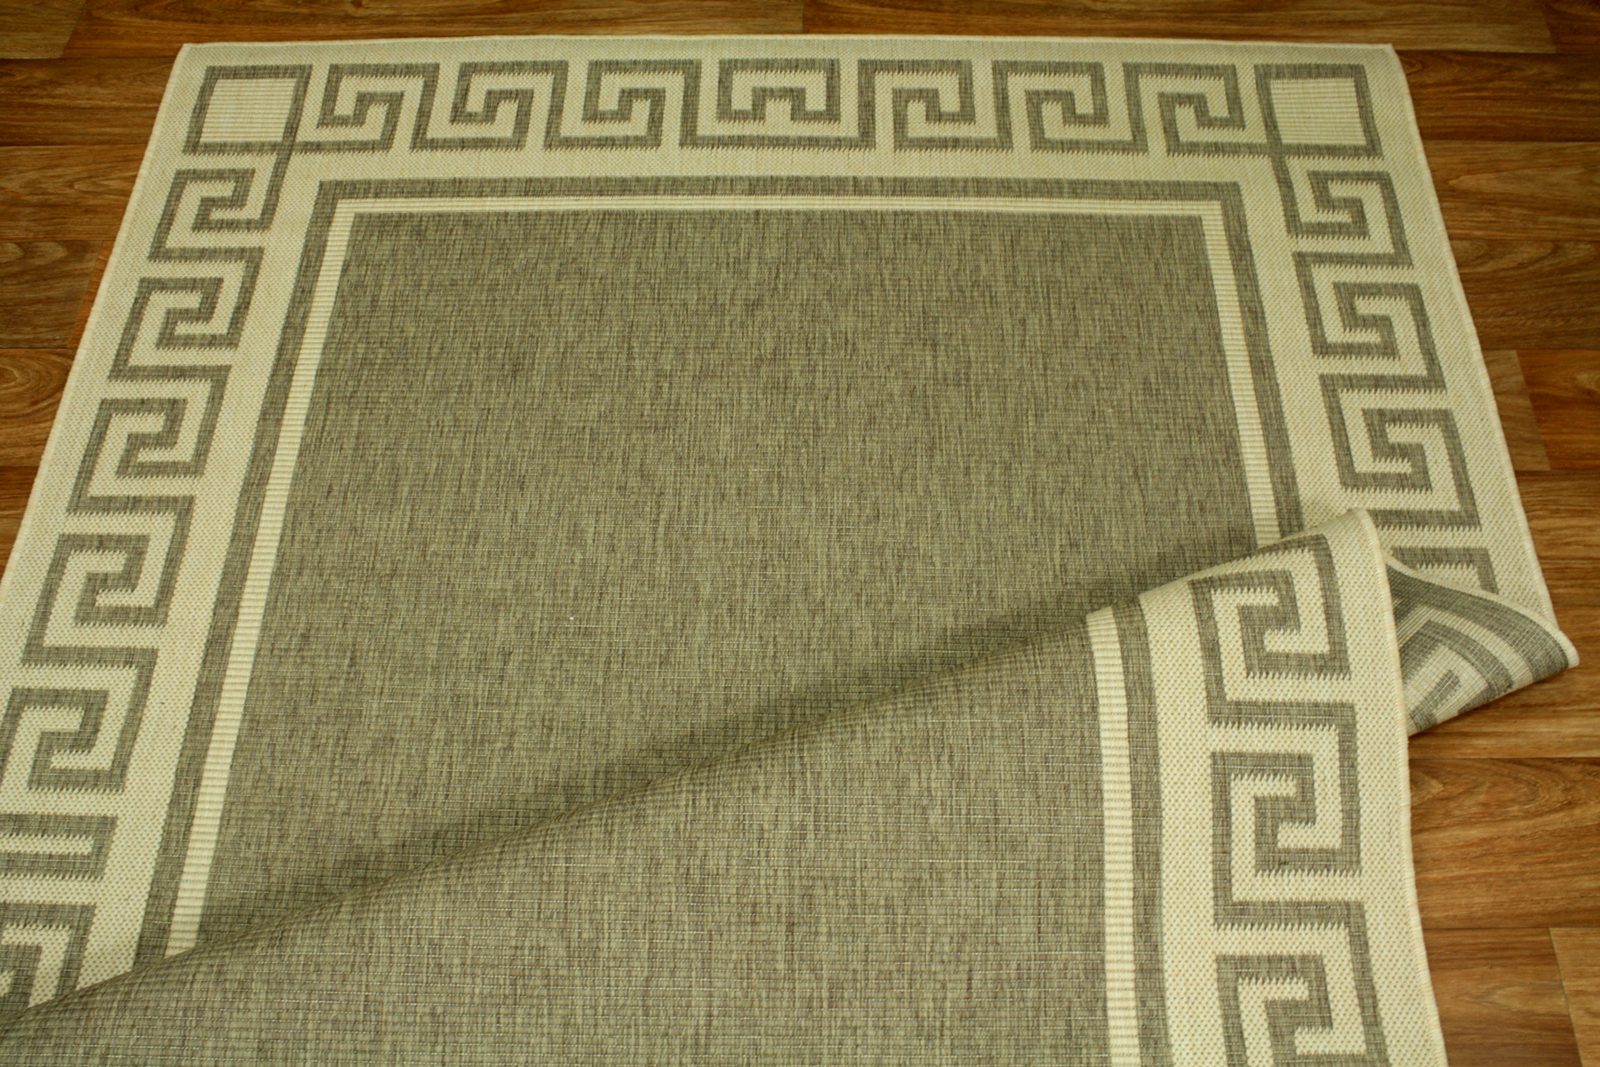 Teppich Agnella Diuna Branta dunkles beige flach gewebt s1